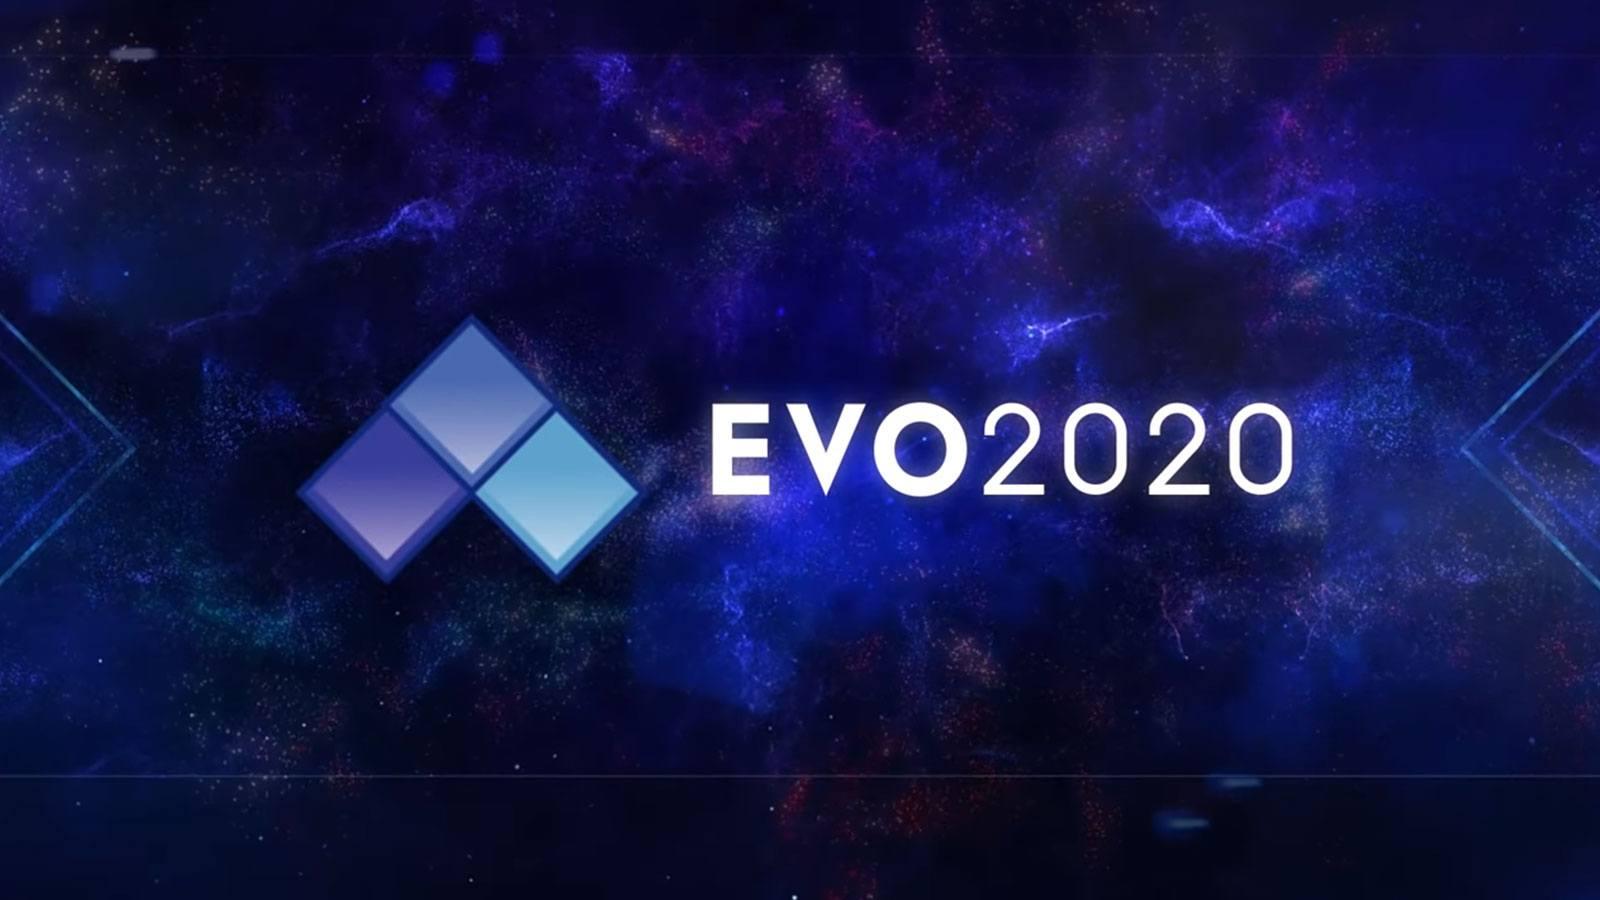 affiche officielle EVO 2020